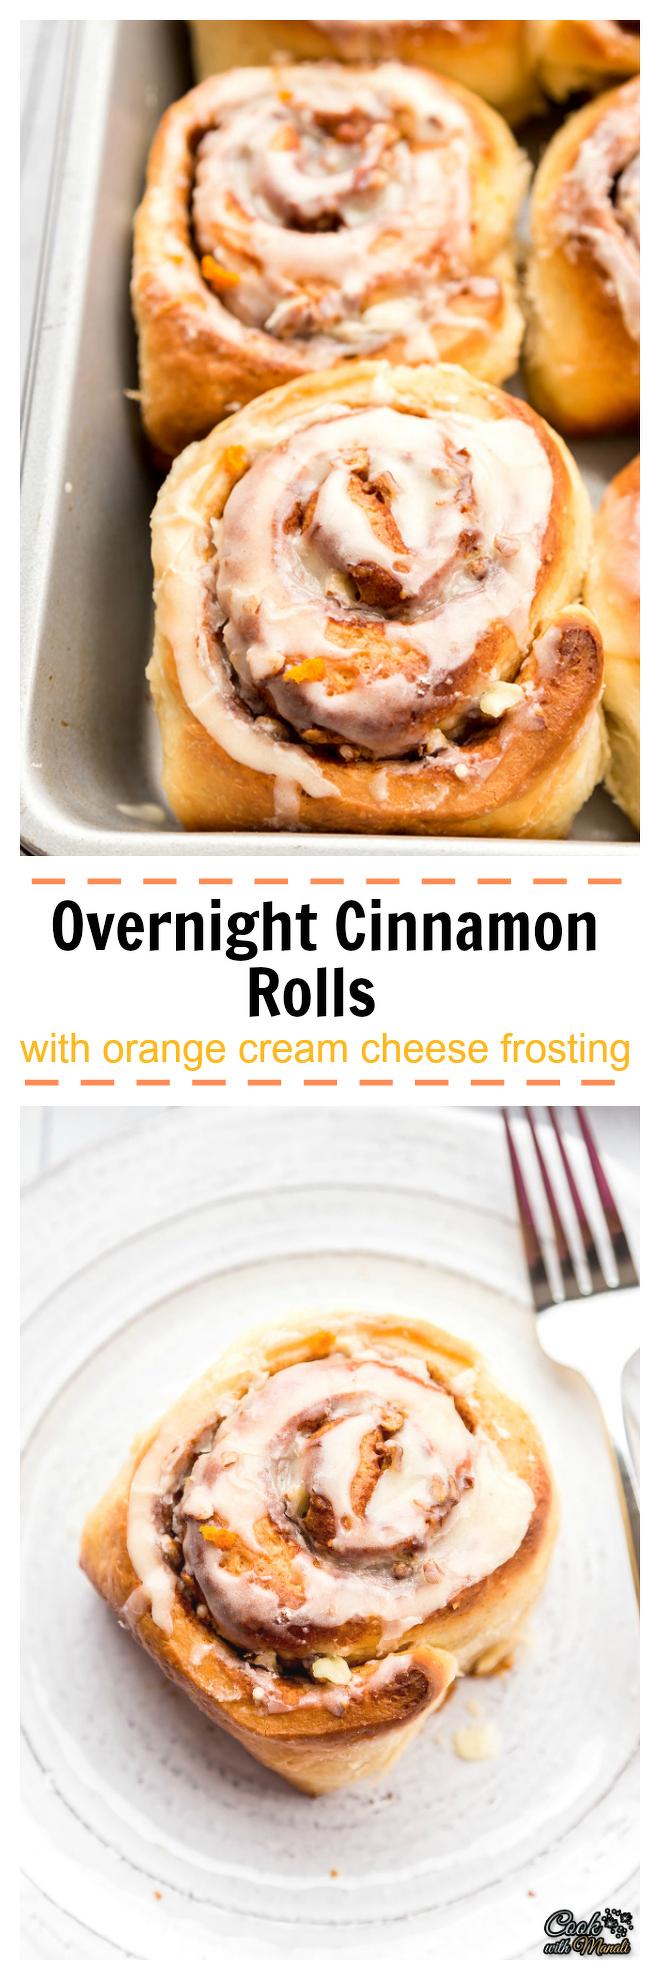 Overnight Cinnamon Rolls With Orange Cream Cheese Collage-nocwm